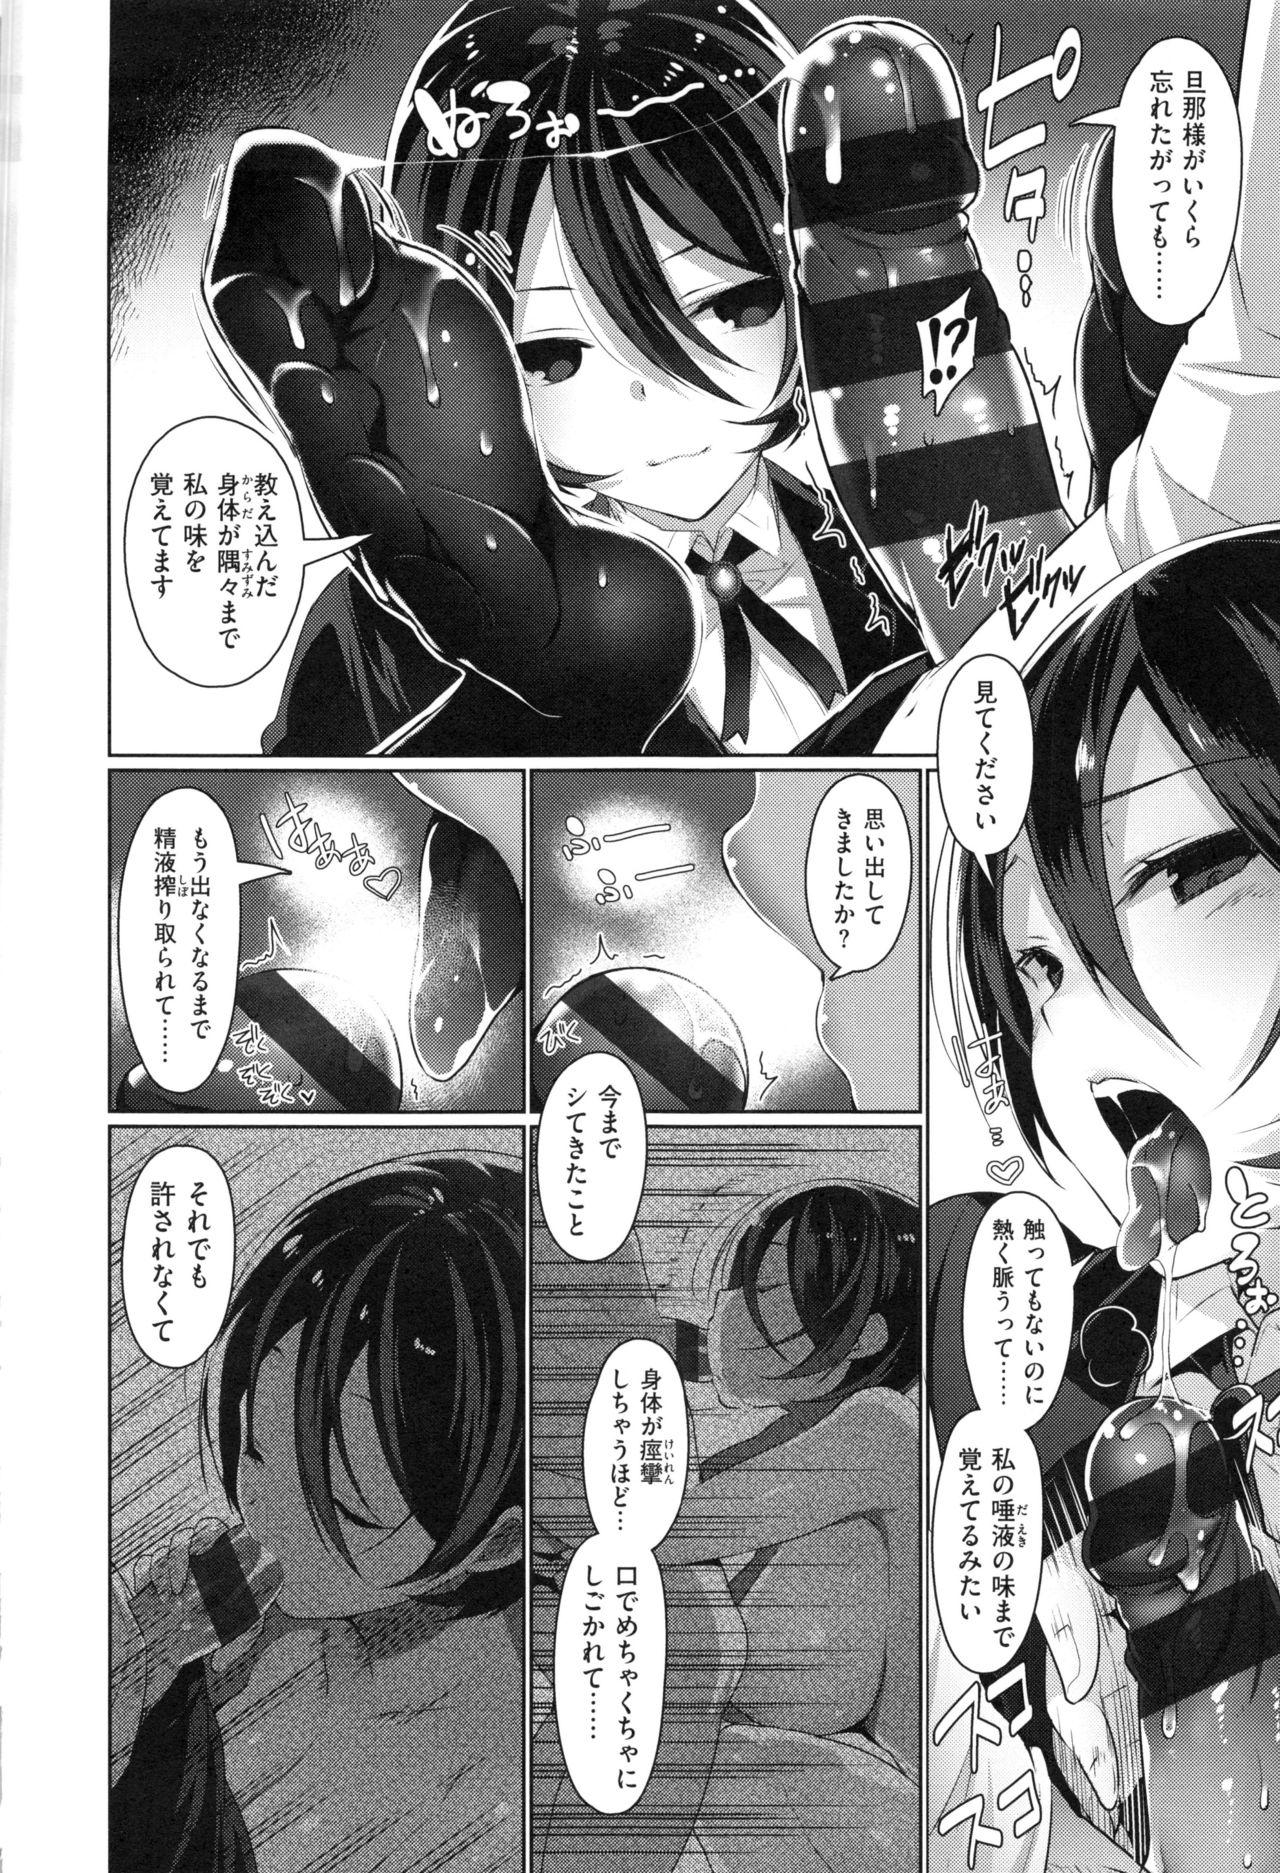 Himitsudere - Secret Love 159